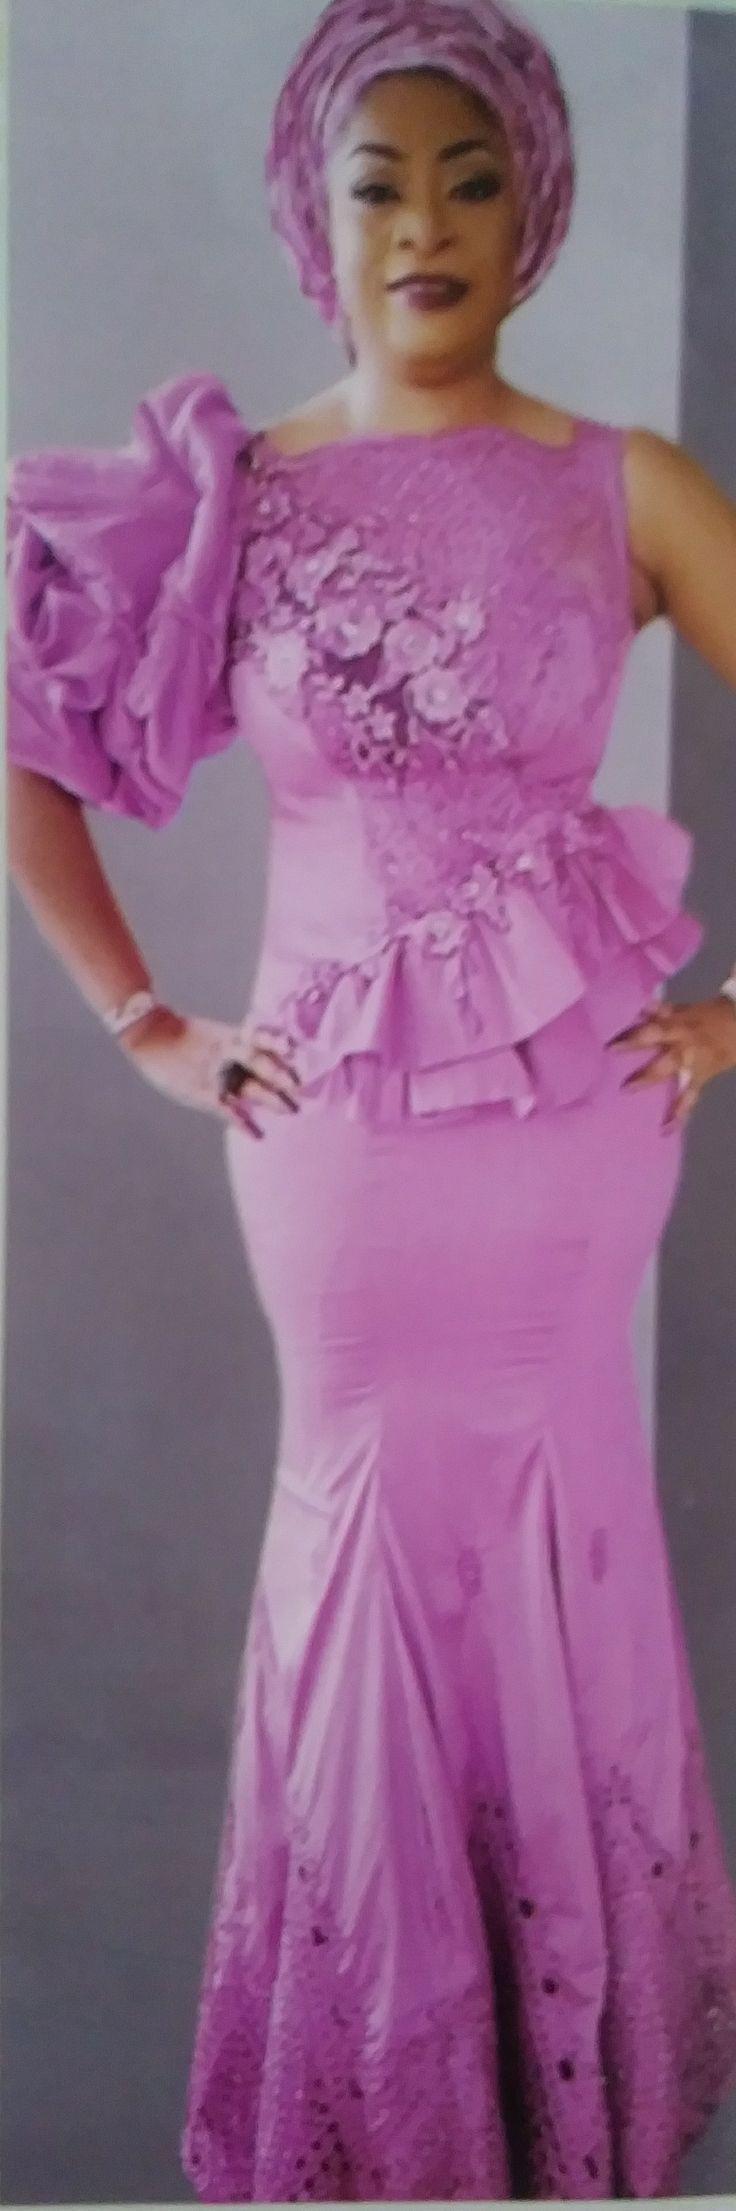 Mejores 380 imágenes de corsets en Pinterest | Drapeado, Alta ...